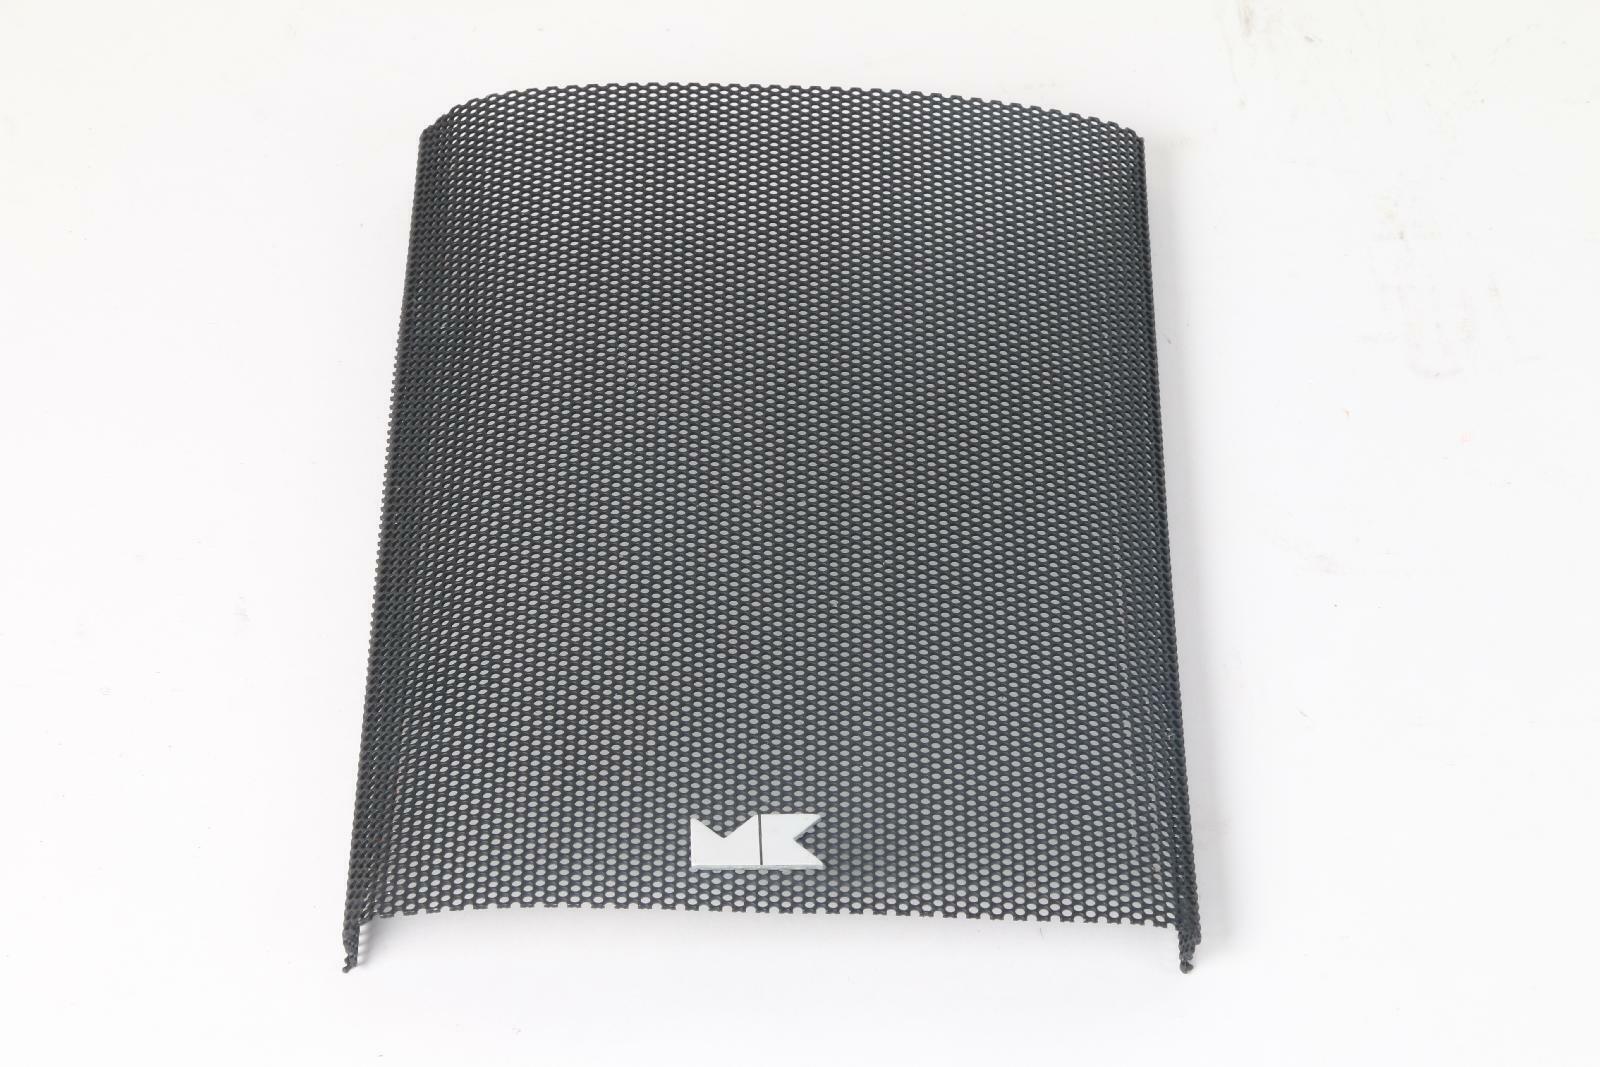 Miller & Kreisel Grill for Surround-550THX Surround Speaker